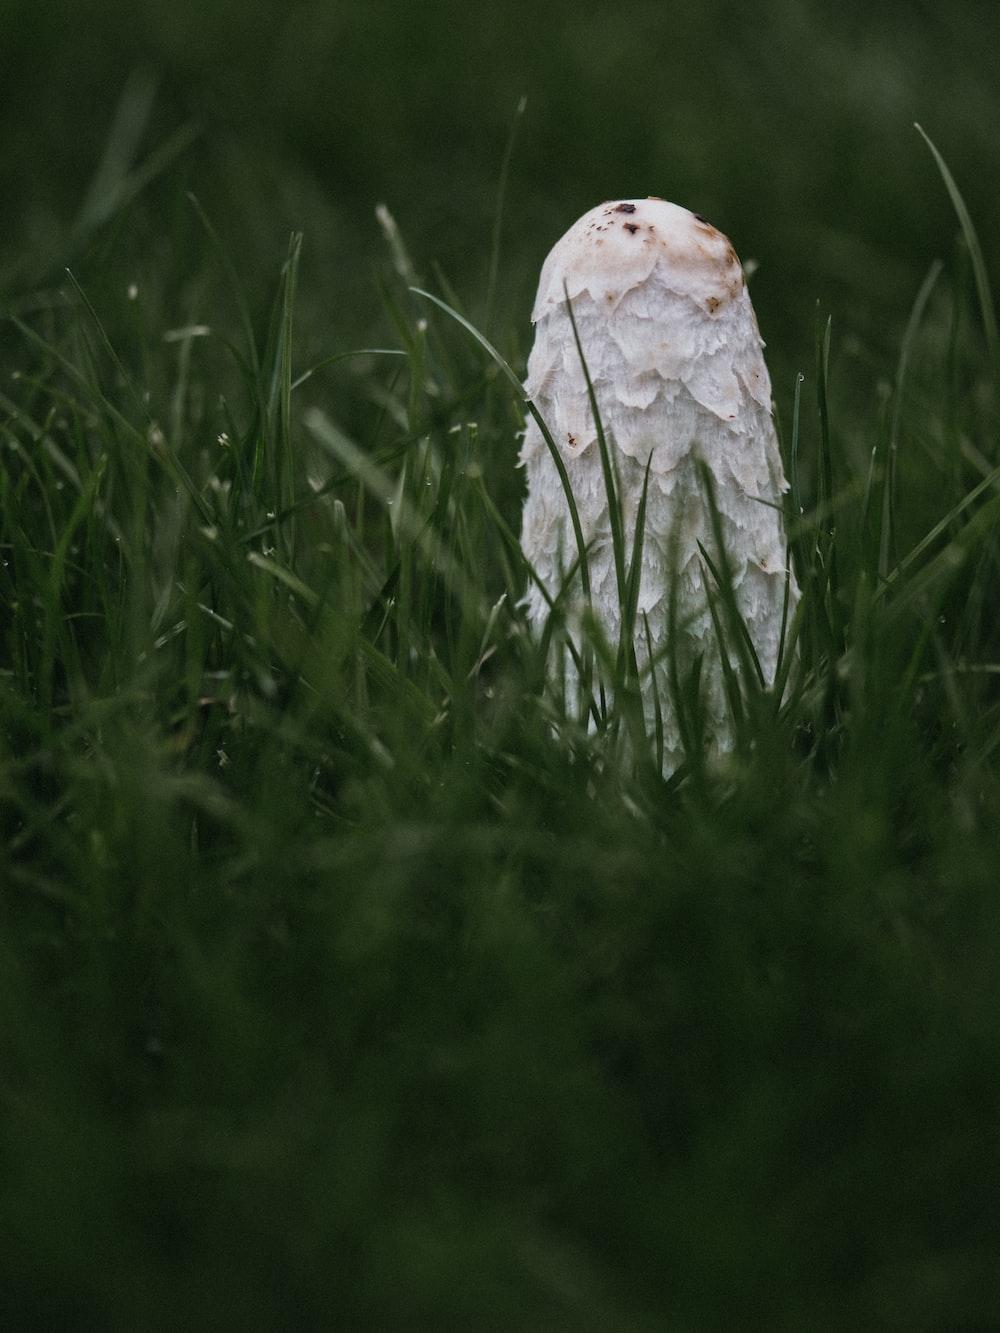 macro photography of white mushroom on green grasses